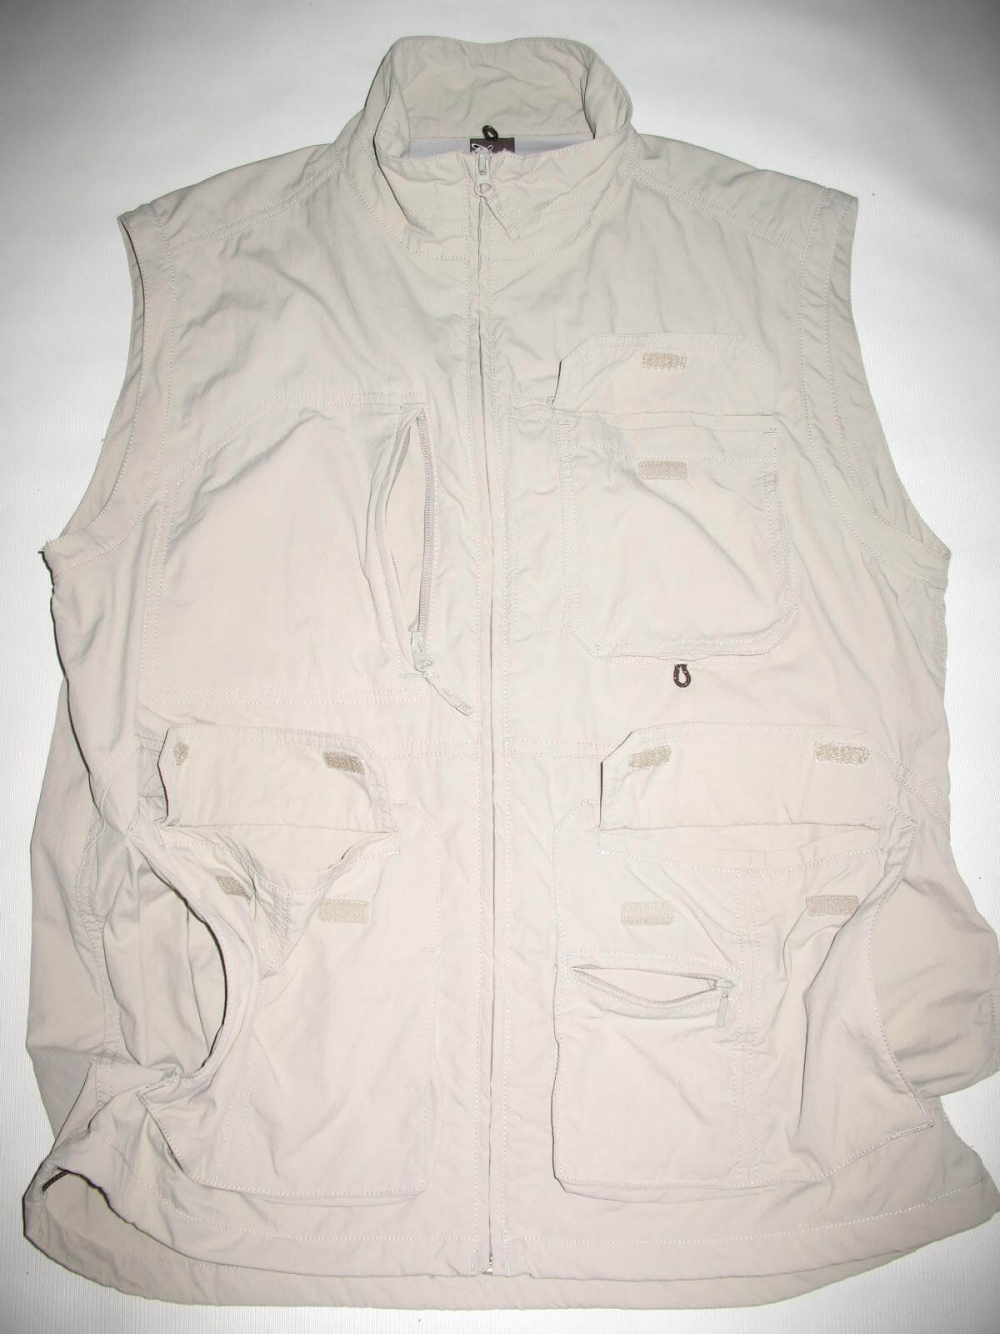 Жилет SALEWA quartz 5c dryton vest (размер 52-XL) - 6